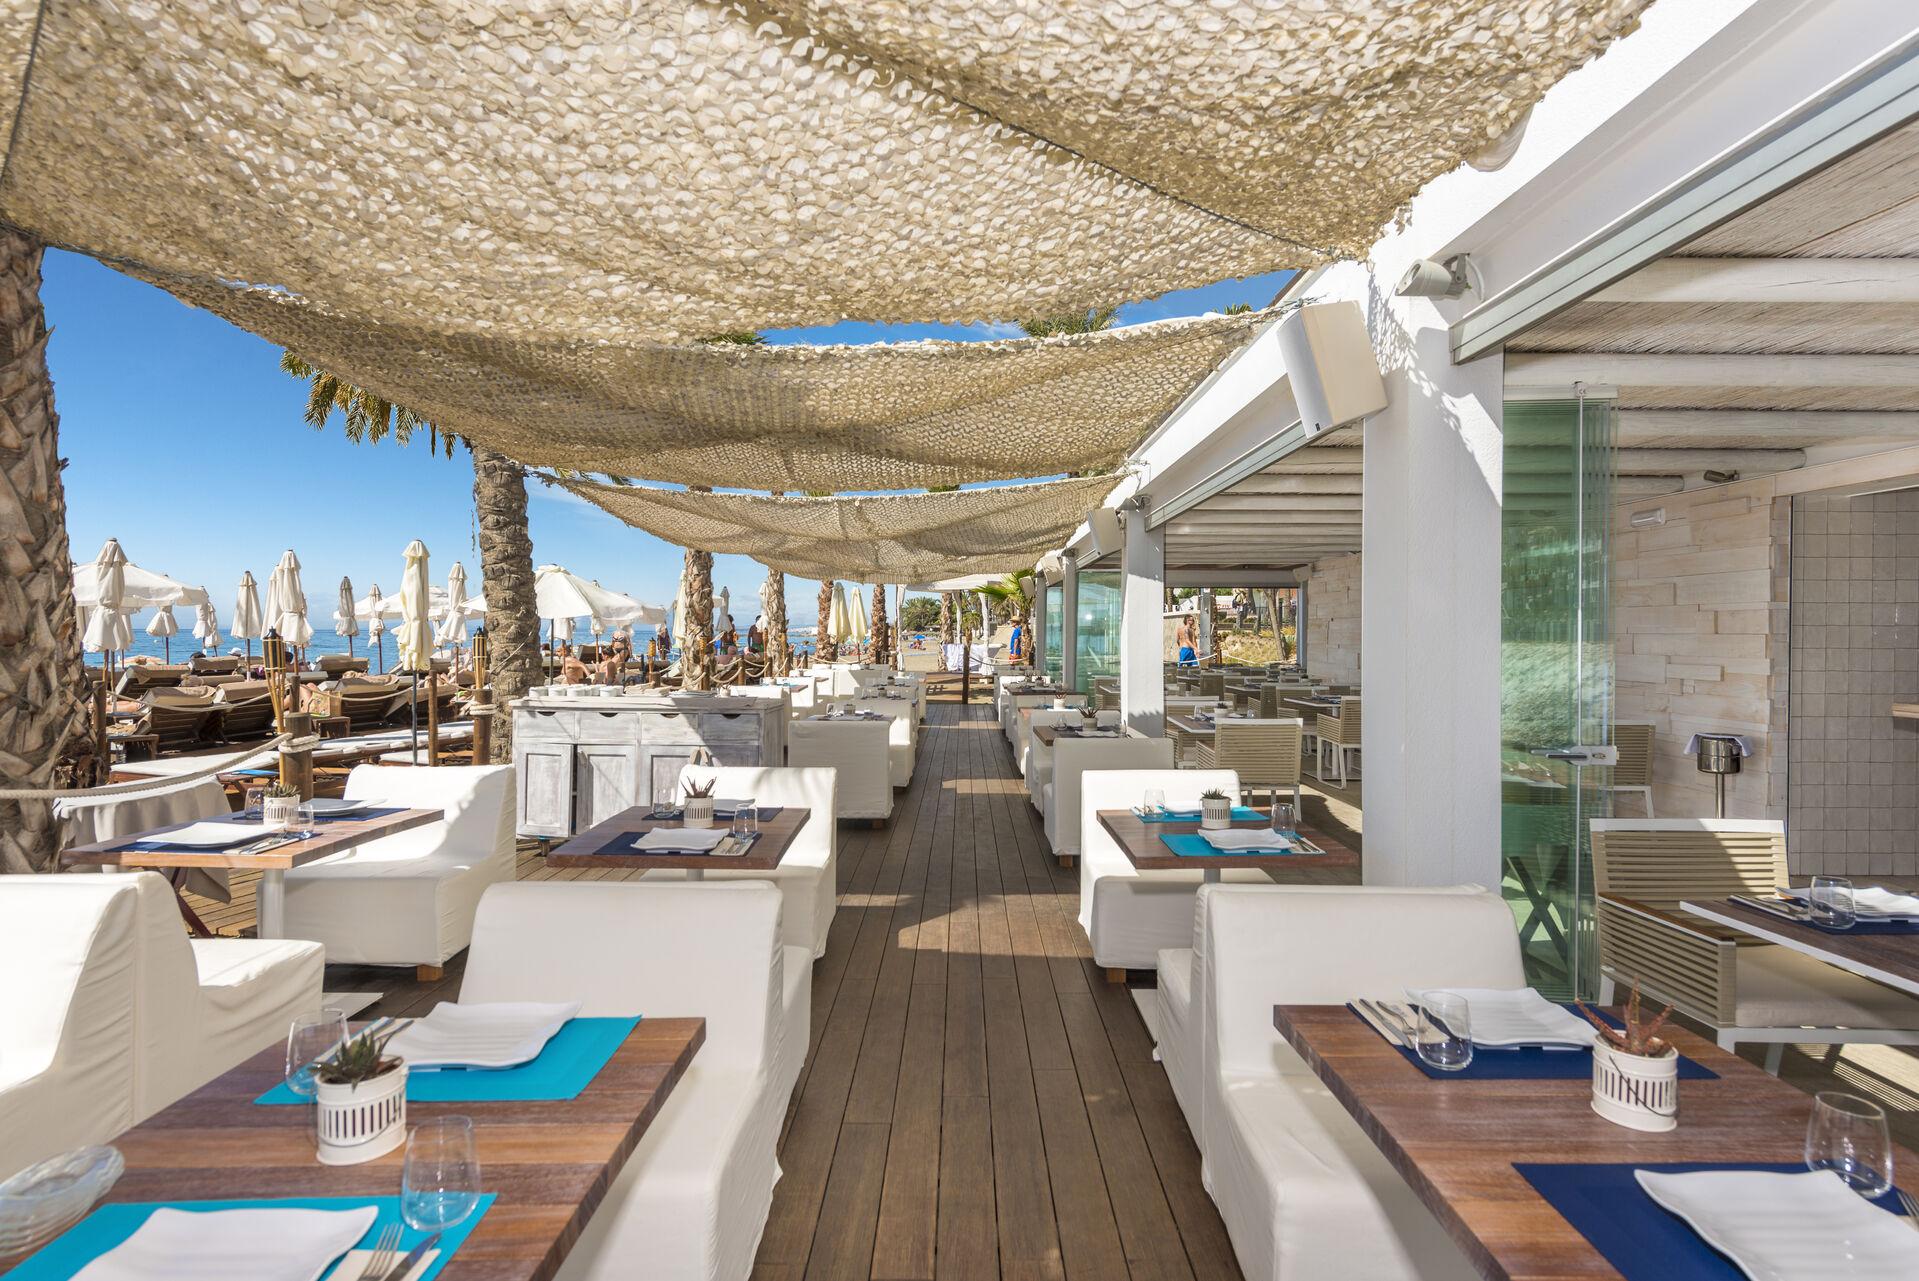 https://cms.satur.sk/data/imgs/tour_image/orig/amare-marbella-beach-restaurante-2-1972162.jpg